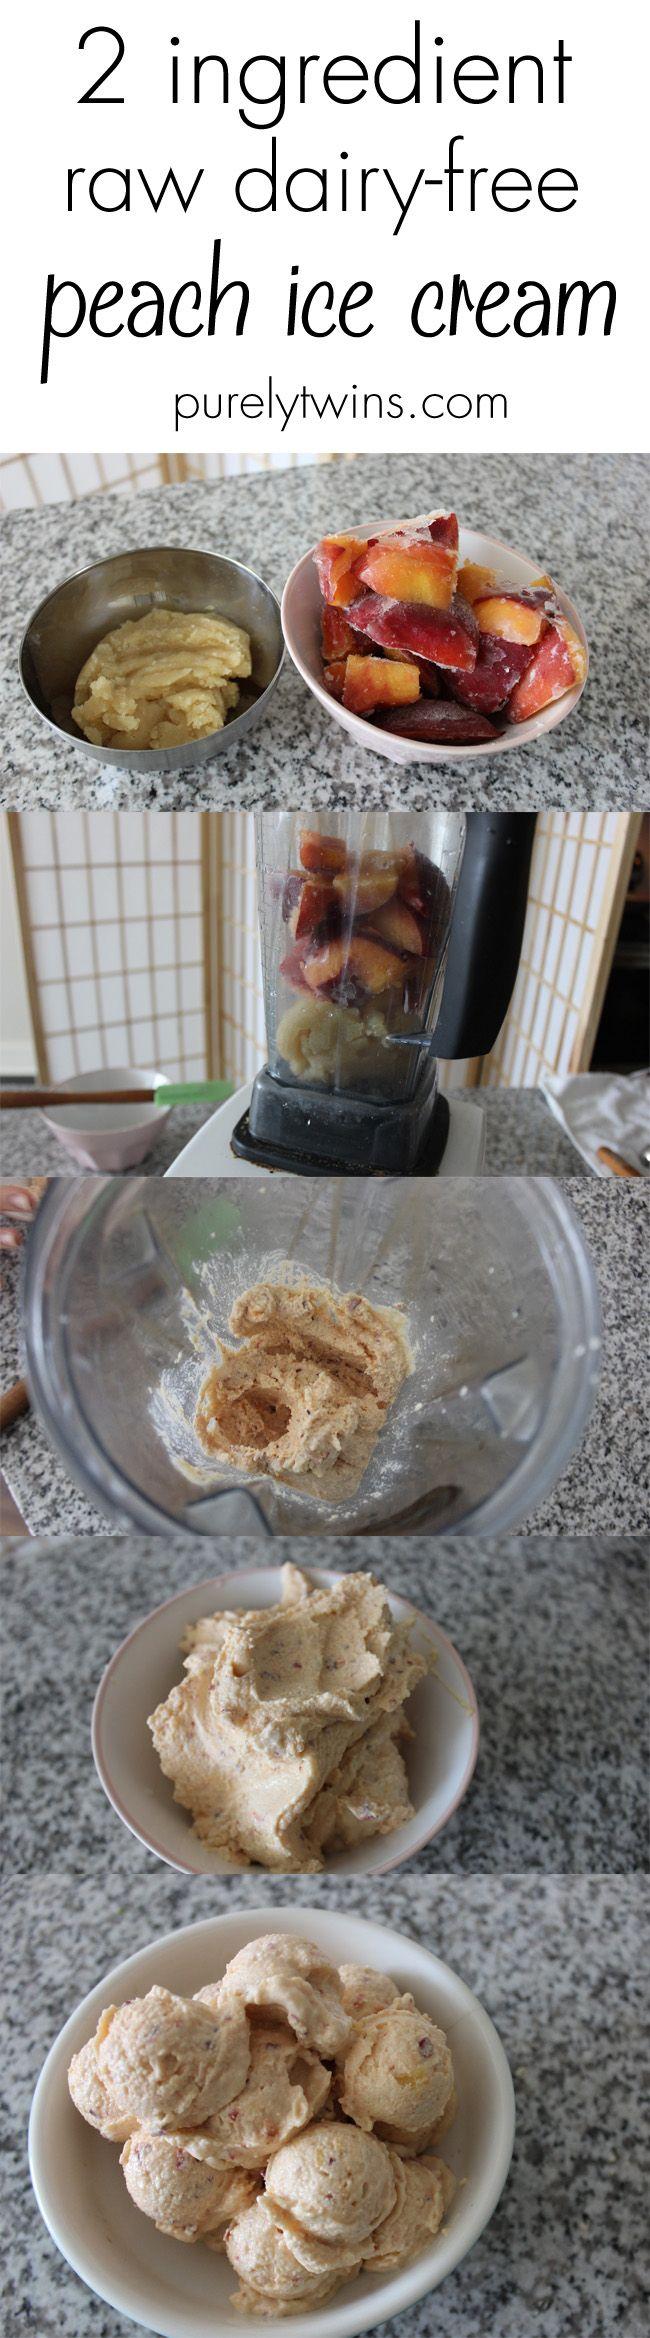 ... Ice-Cream-Scoop/ 2 ingredient raw dairy-free peach ice cream